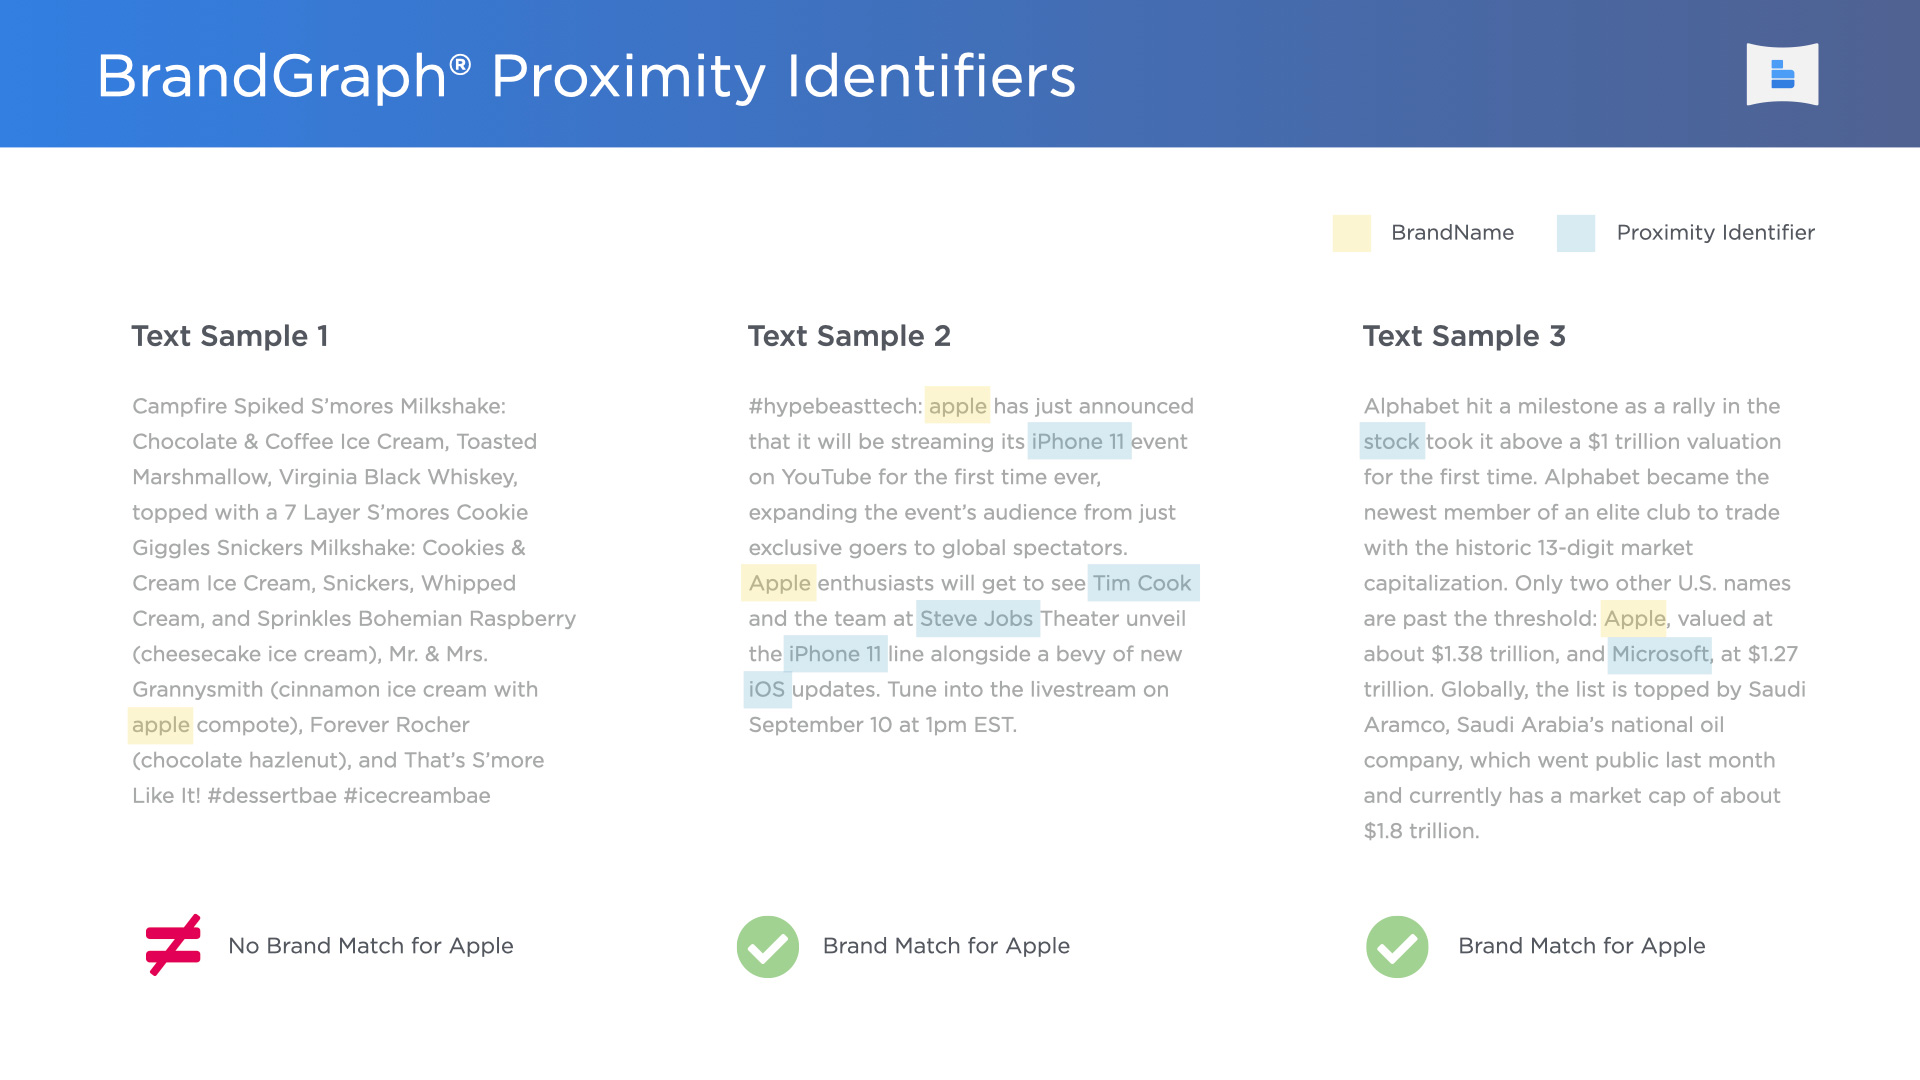 brandgraph-proximity-identifiers